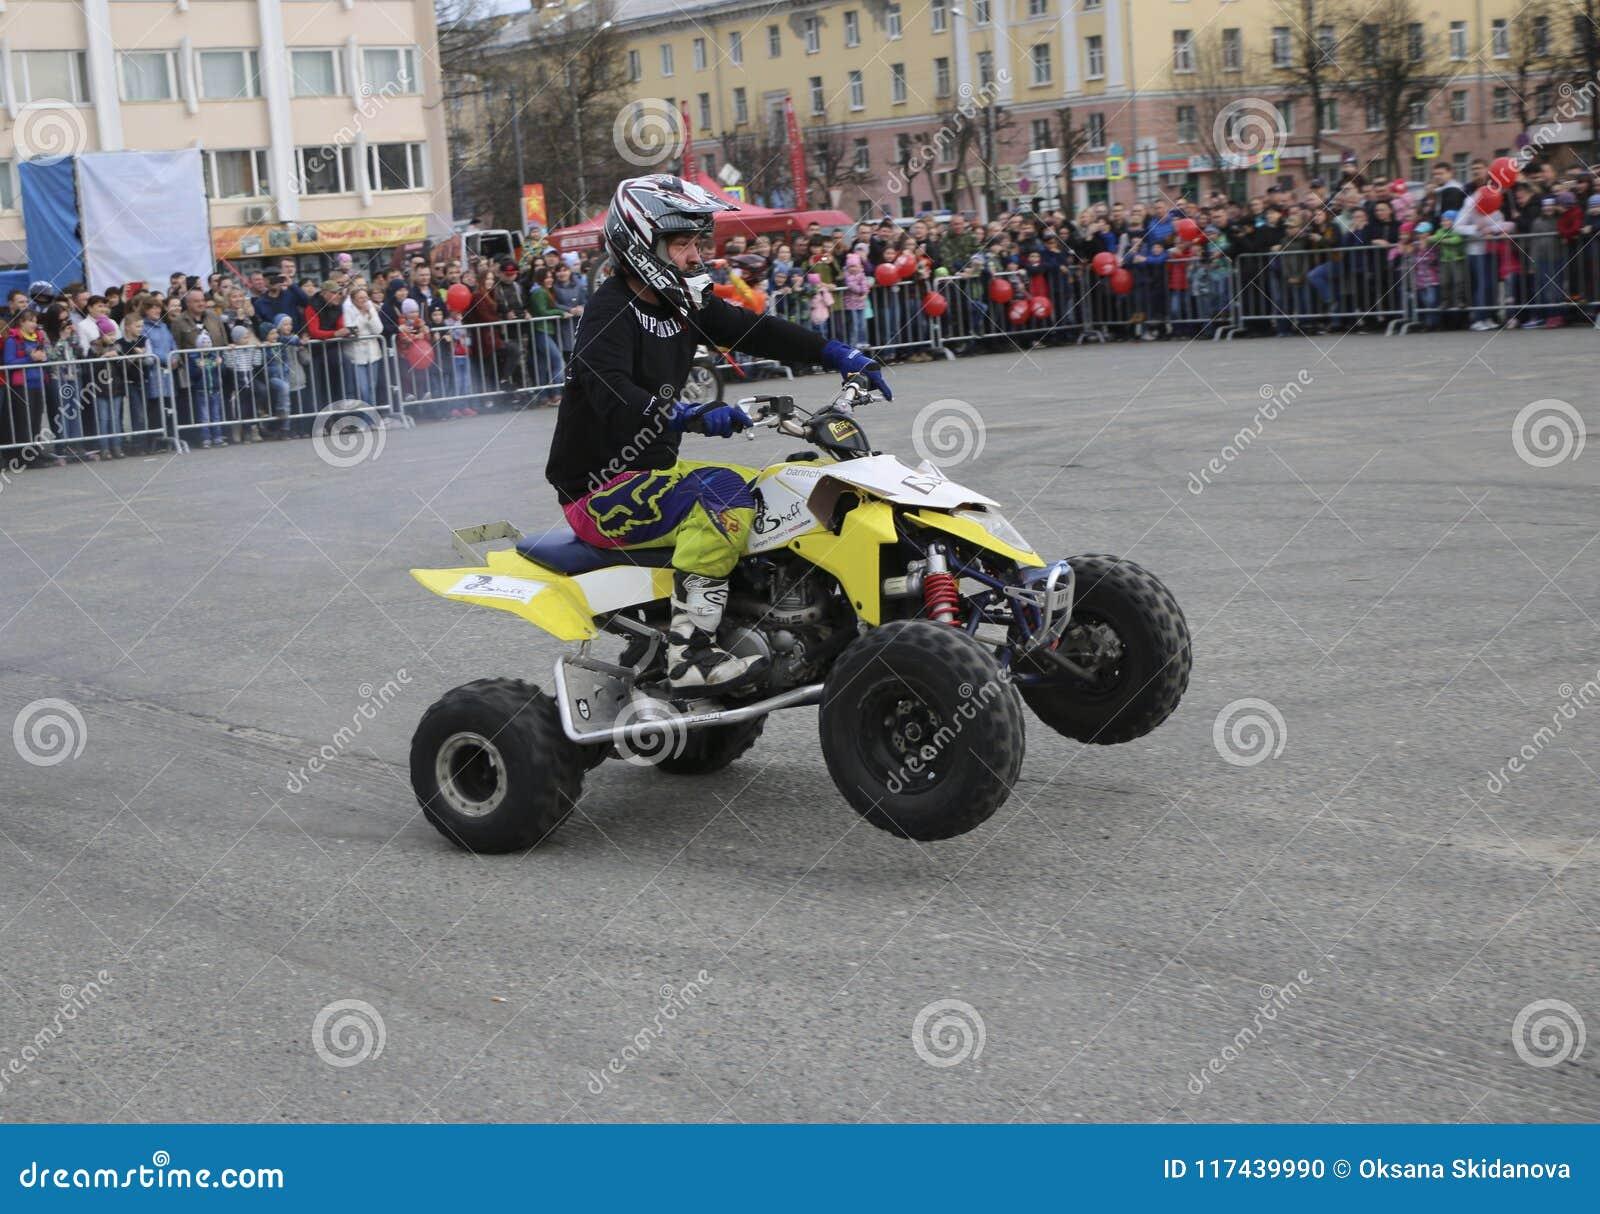 YOSHKAR-OLA, RUSSLAND - 5. MAI 2018: AutoMotoshow im Quadrat Tricks auf ATV StuntRiding Wheelie, Stoppie und Akrobatyka auf Viere